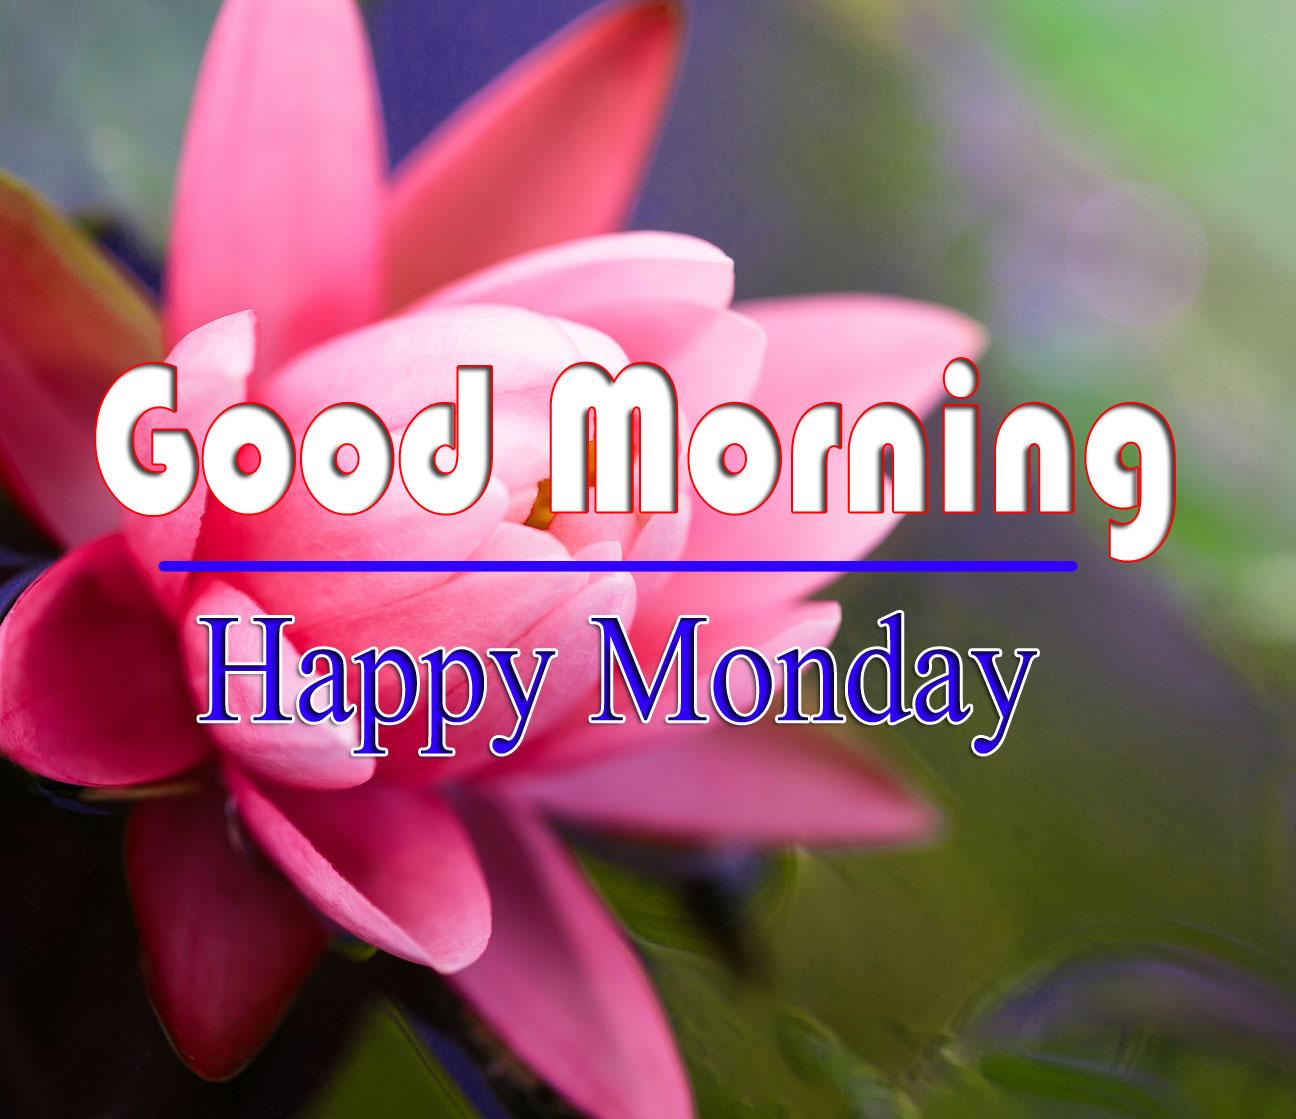 Free HD Monday Good Morning Images 1